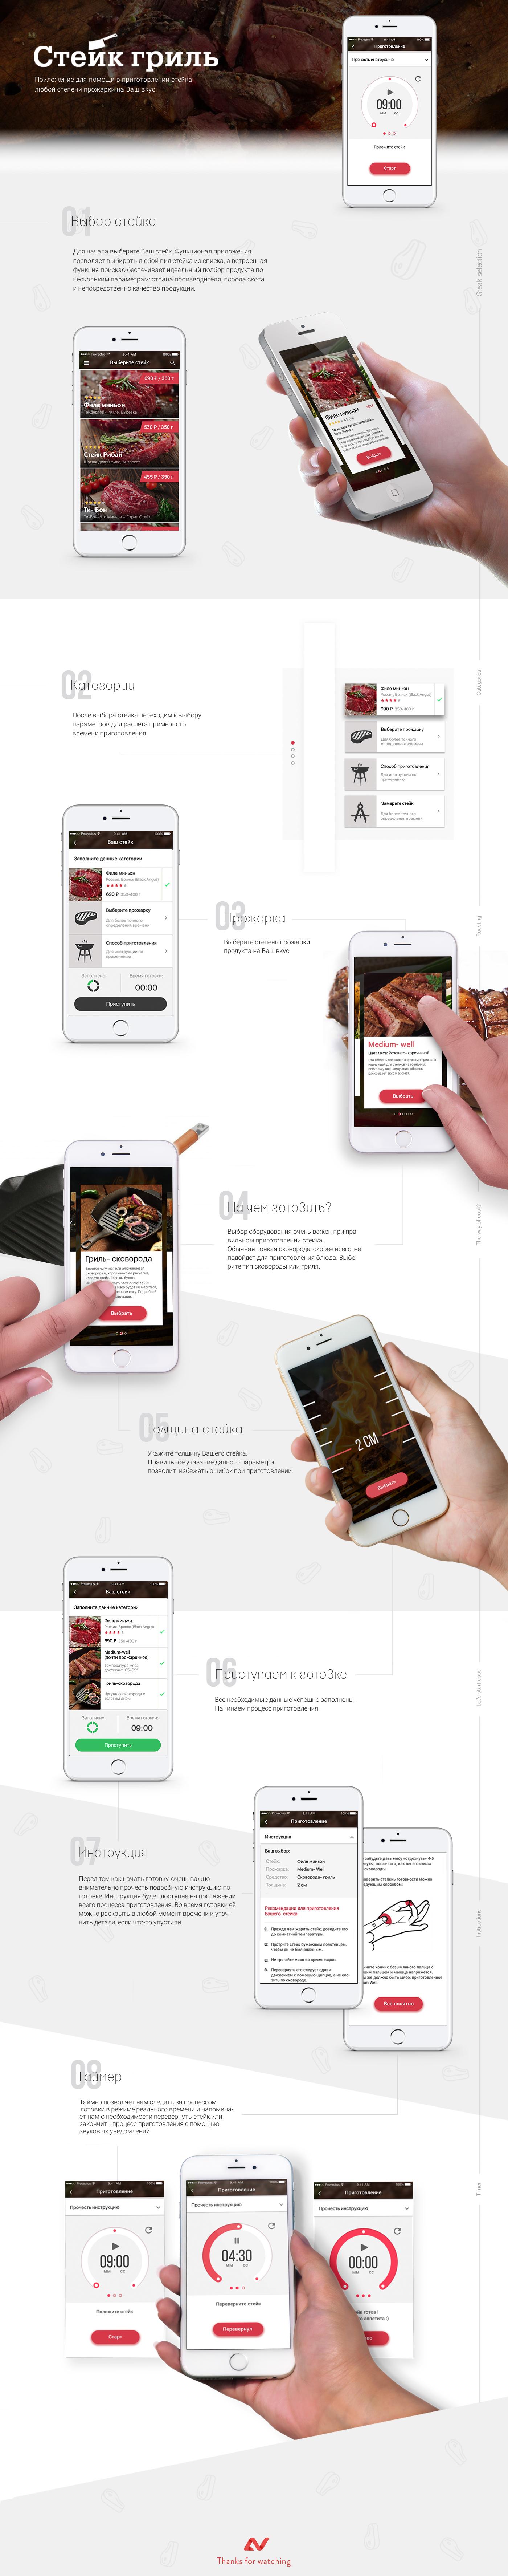 steak Mobile app app UI ux interaction ios iphone concept